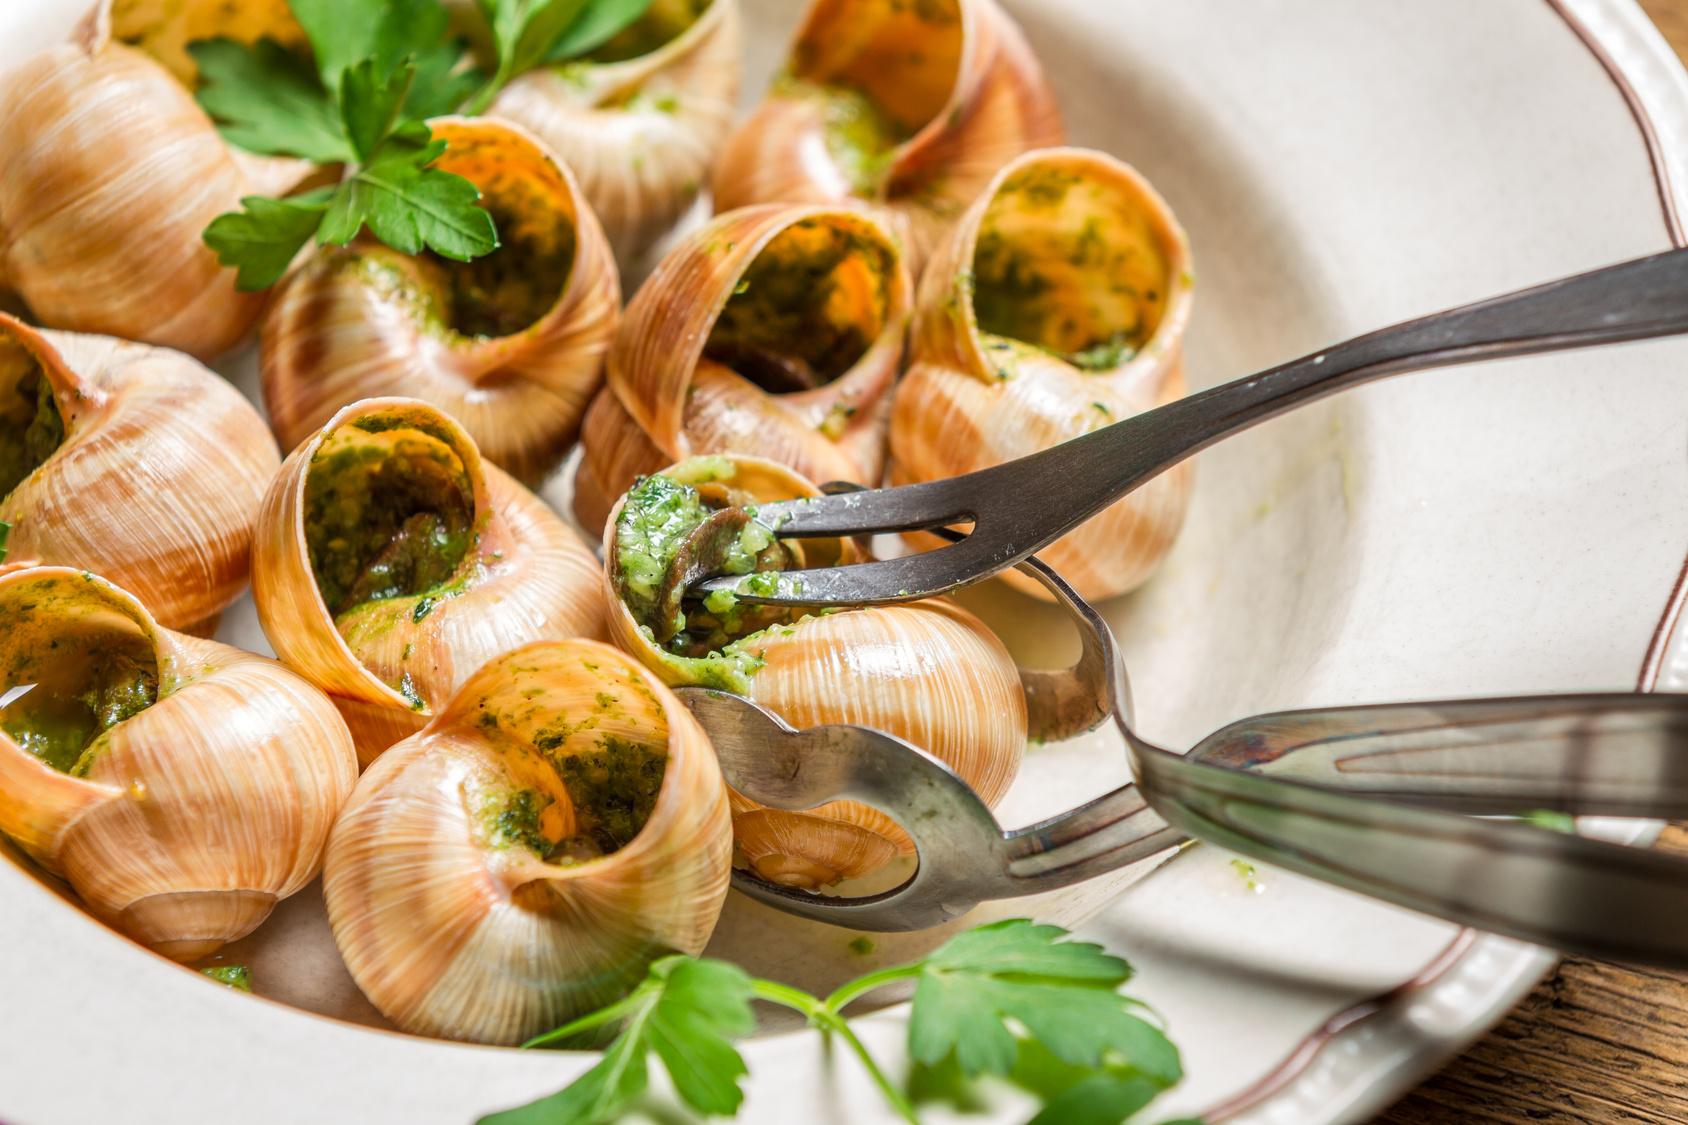 Gastronom a de par s viajar a francia - Cuisiner les escargots de bourgogne ...